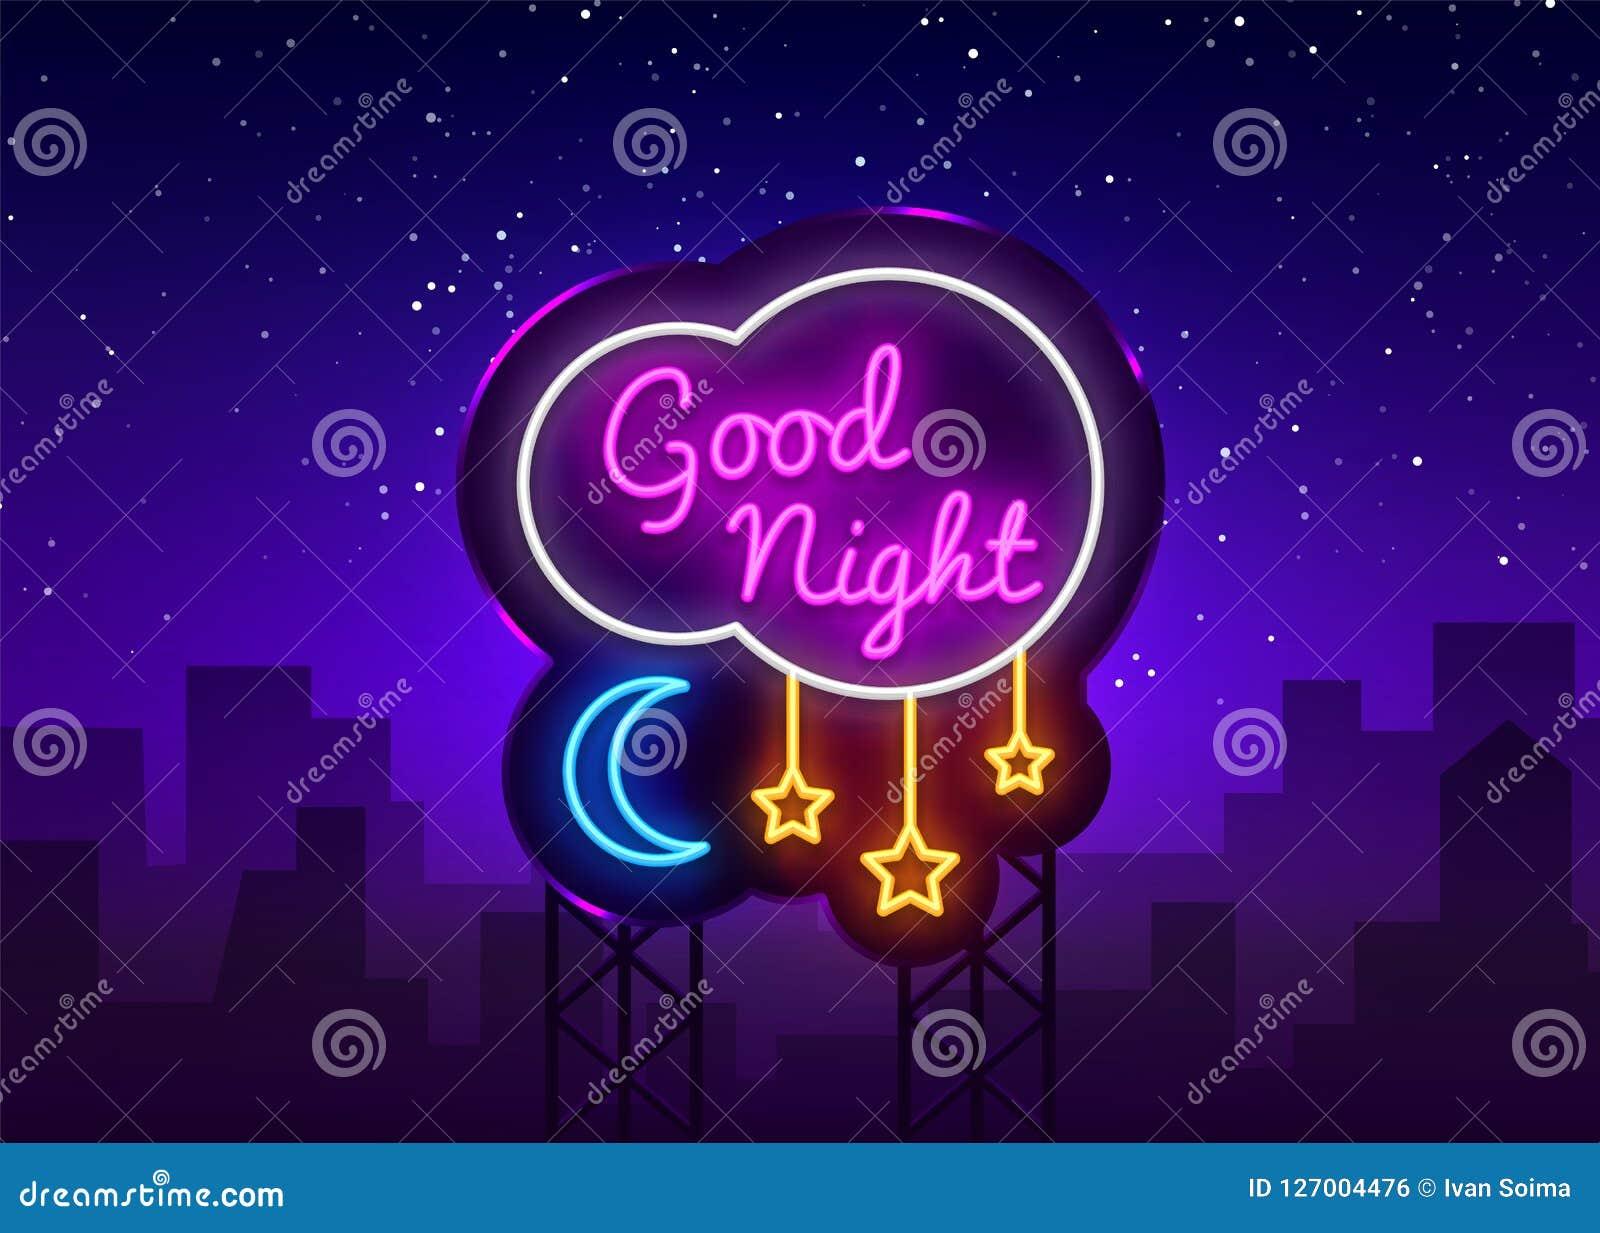 Good Night Neon Sign Vector. Good Night neon text, design template, modern trend design, night neon signboard, night